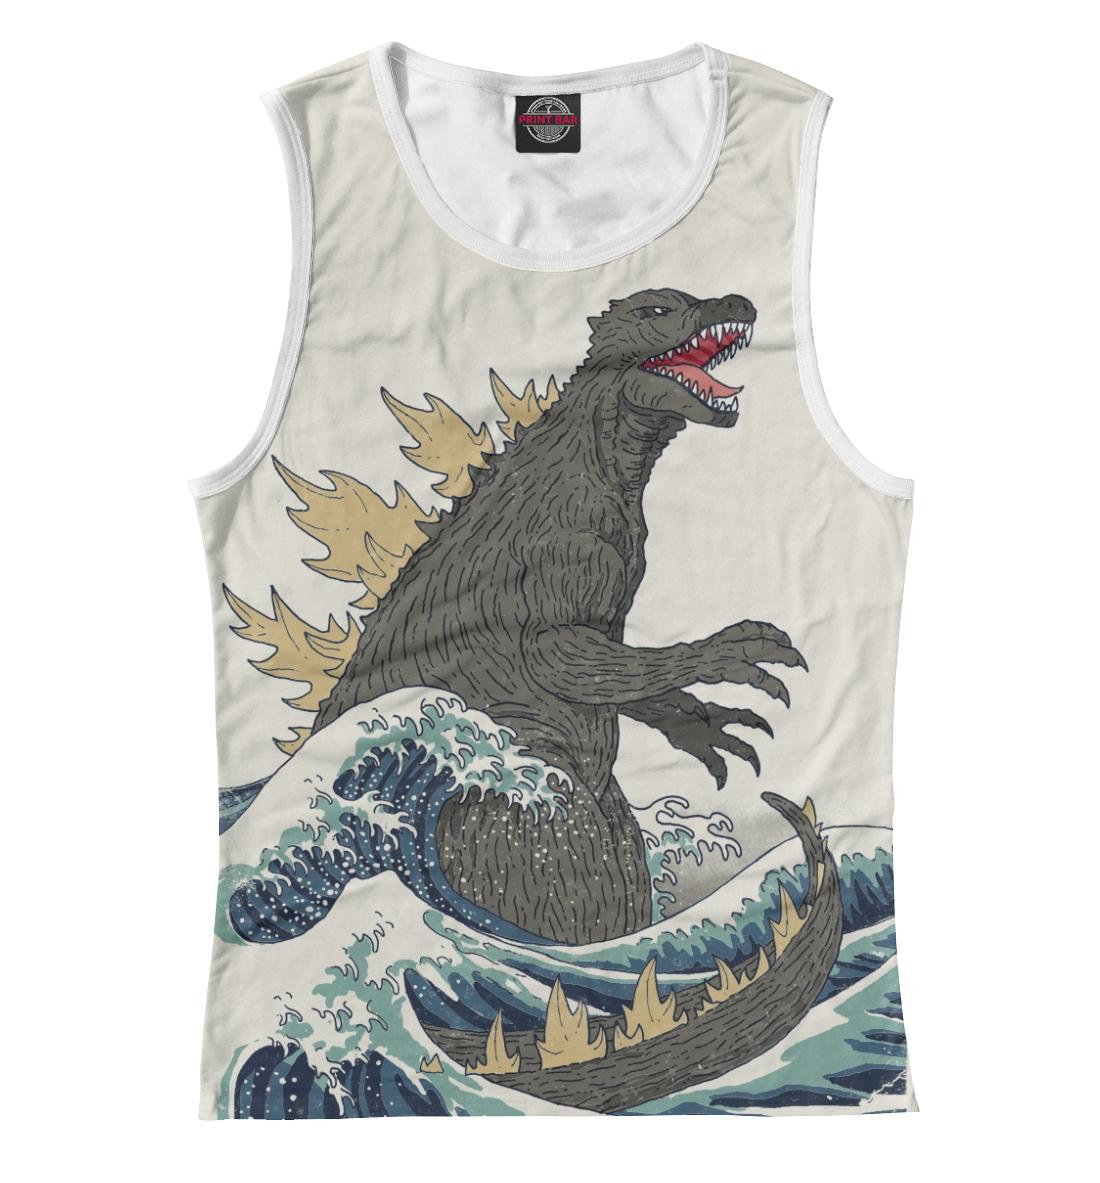 Купить Godzilla, Printbar, Майки, KNO-948120-may-1